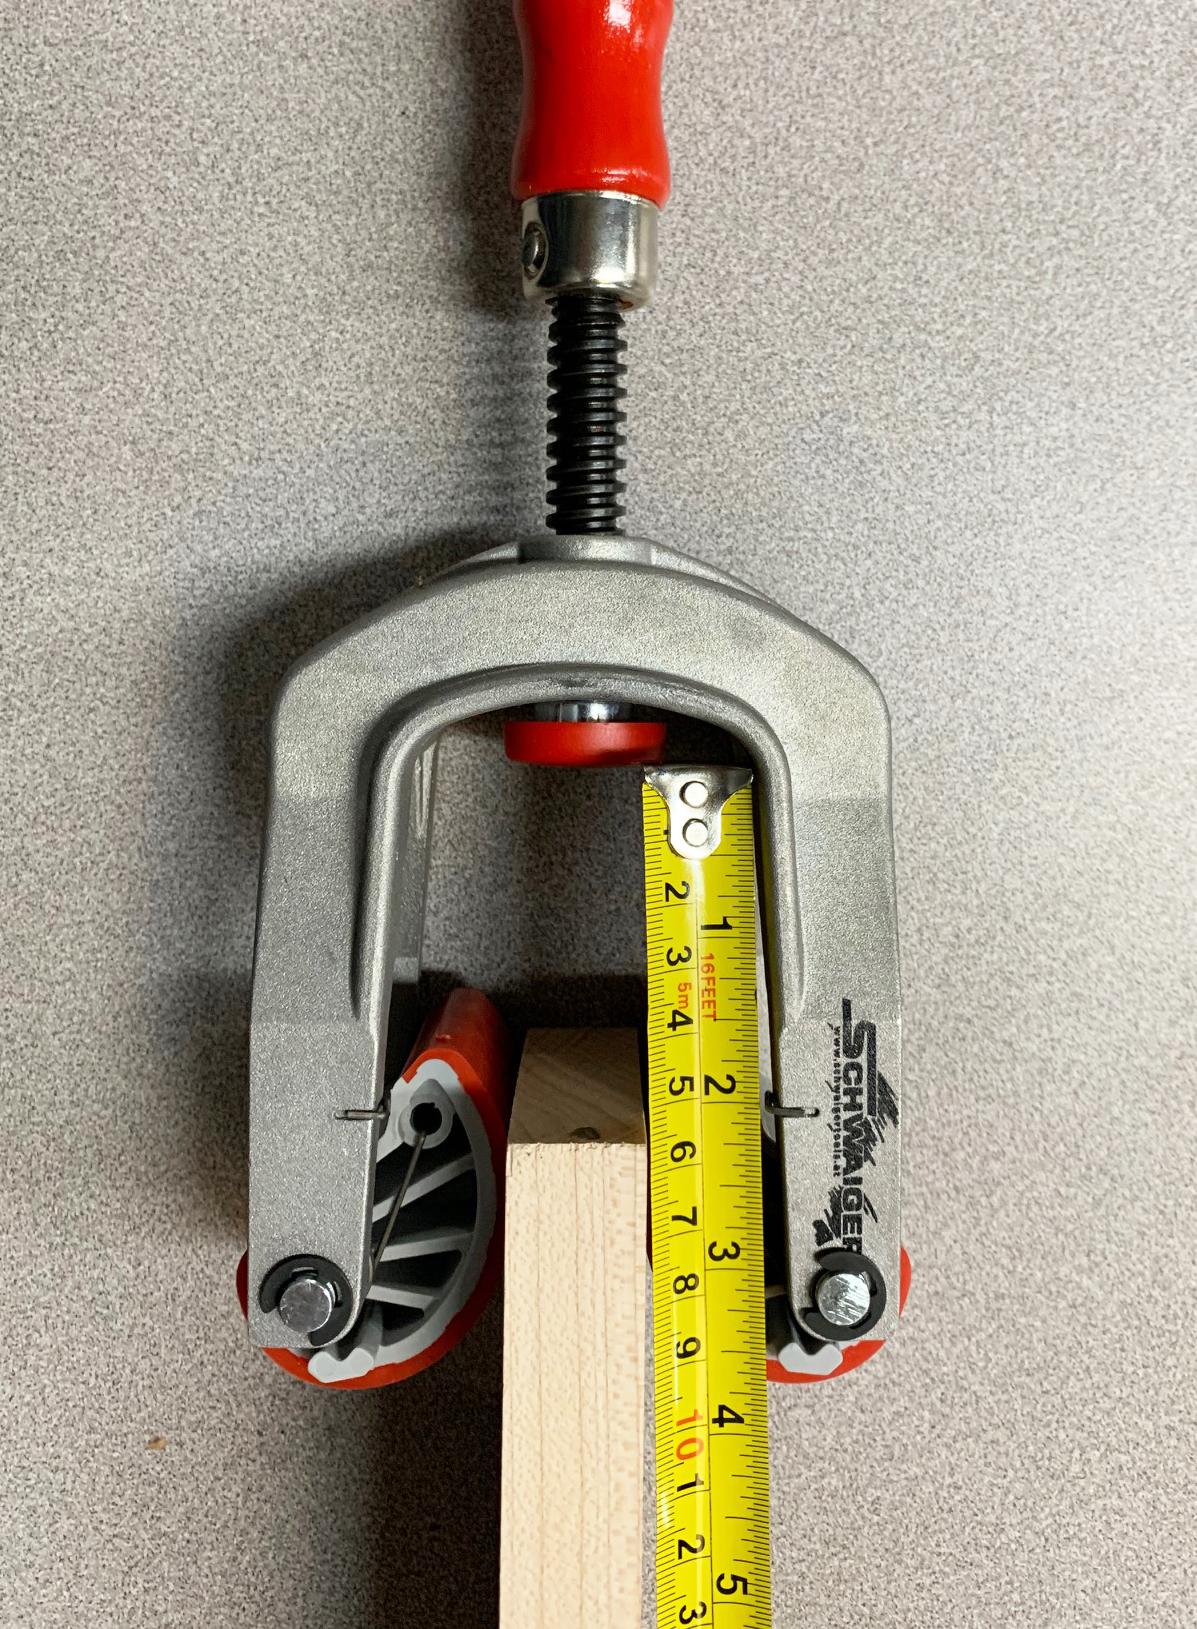 spwe0071-edge-clamp-standard-0-48mm-max.-edge-width-by-hoffmann-usa.jpg